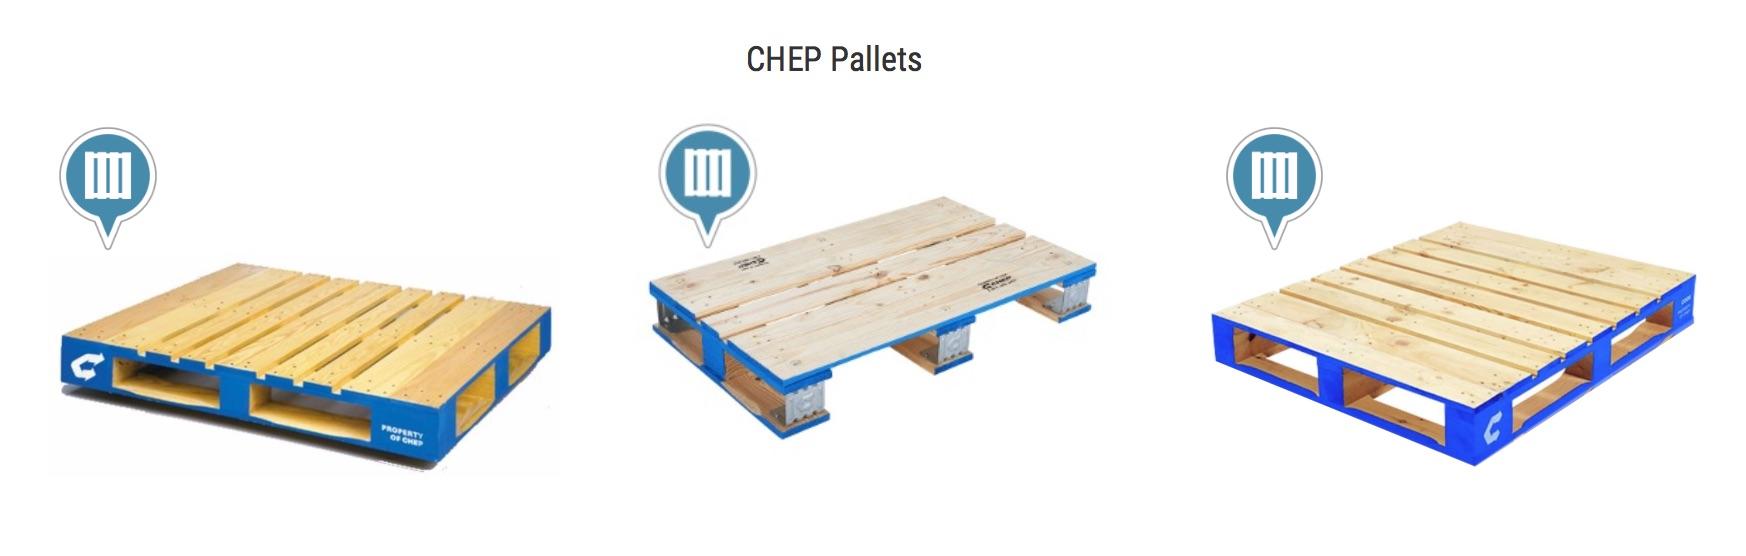 CHEP Pallets